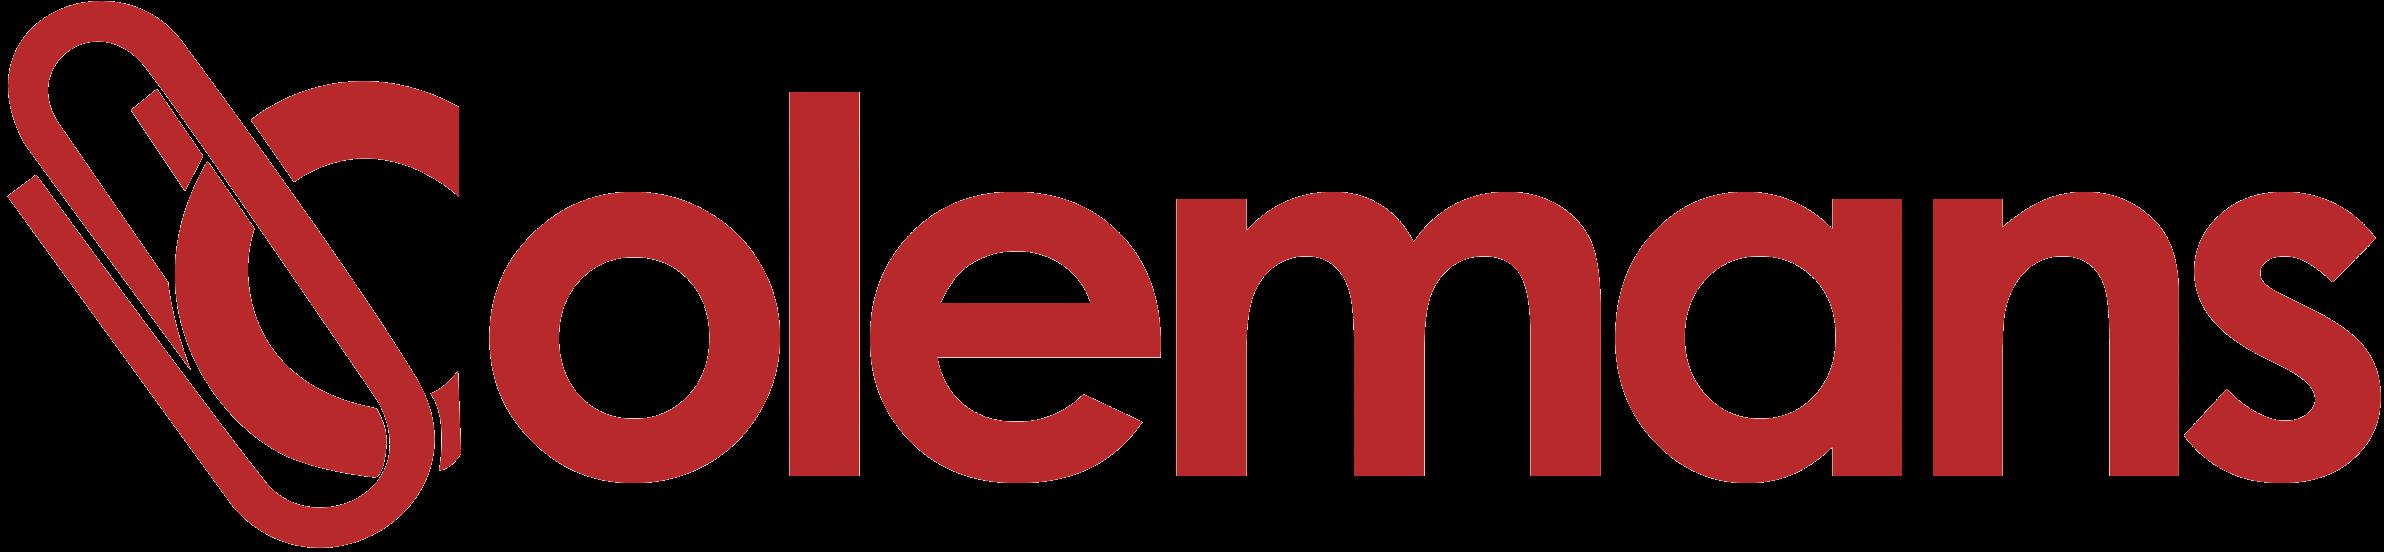 colemans logo